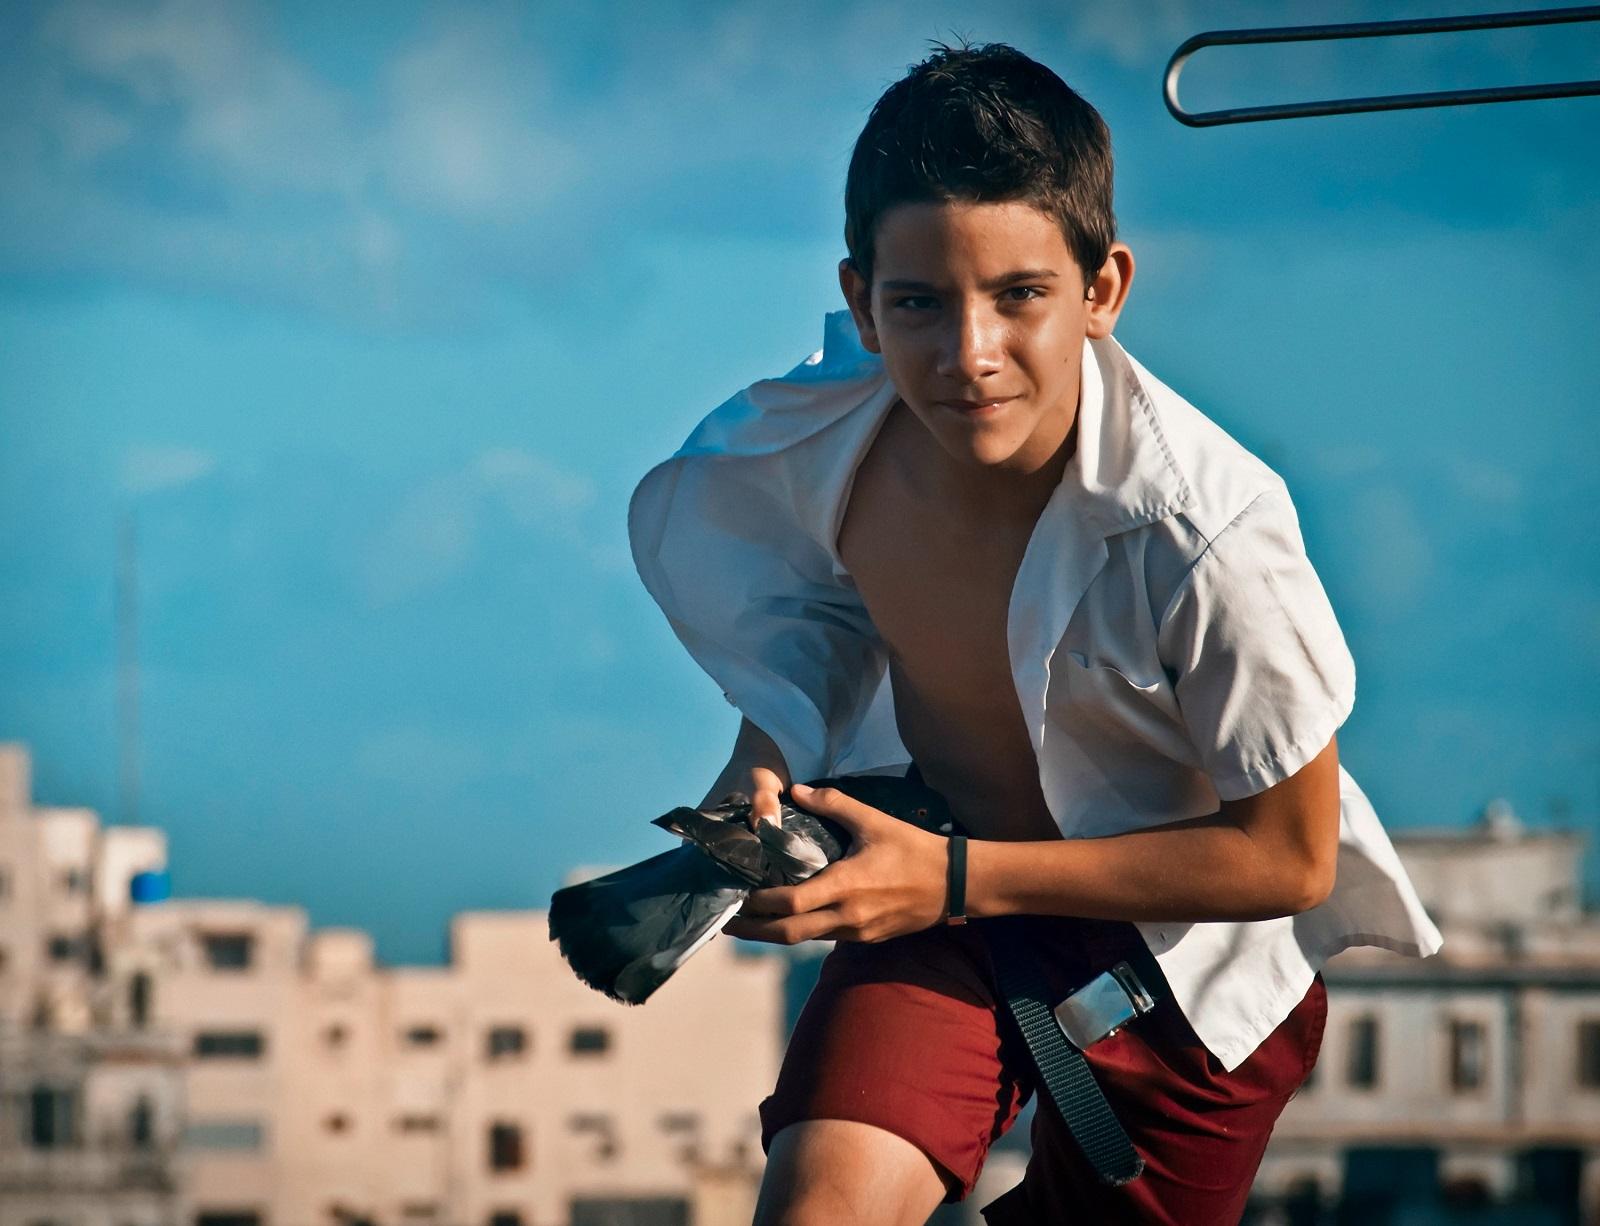 Conducta / Behaviour / Συμπεριφορά FeCHA Φεστιβάλ Ισπανόφωνου Κινηματογράφου